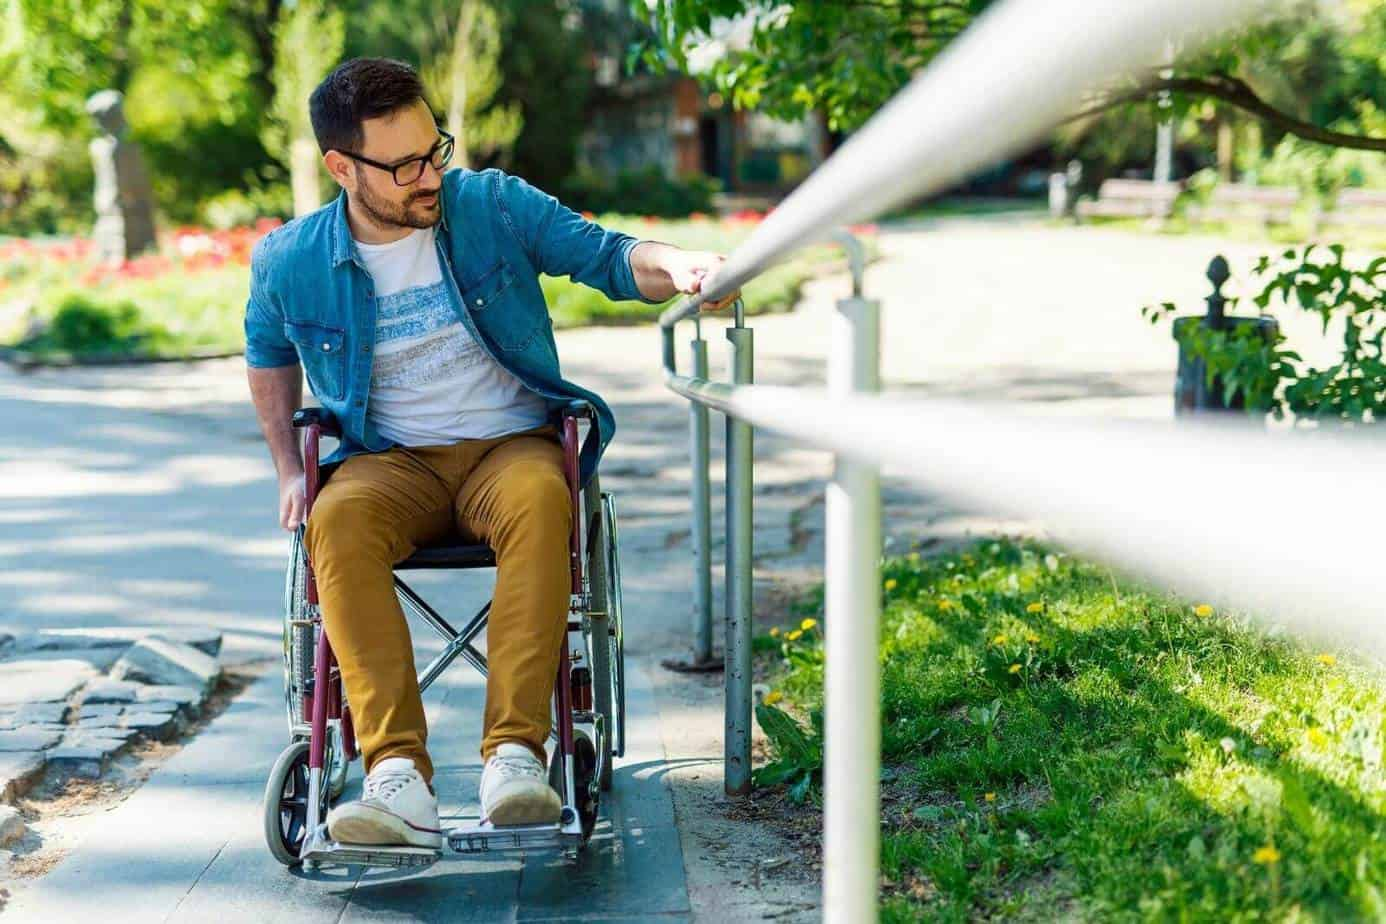 a man using a wheelchair at the park